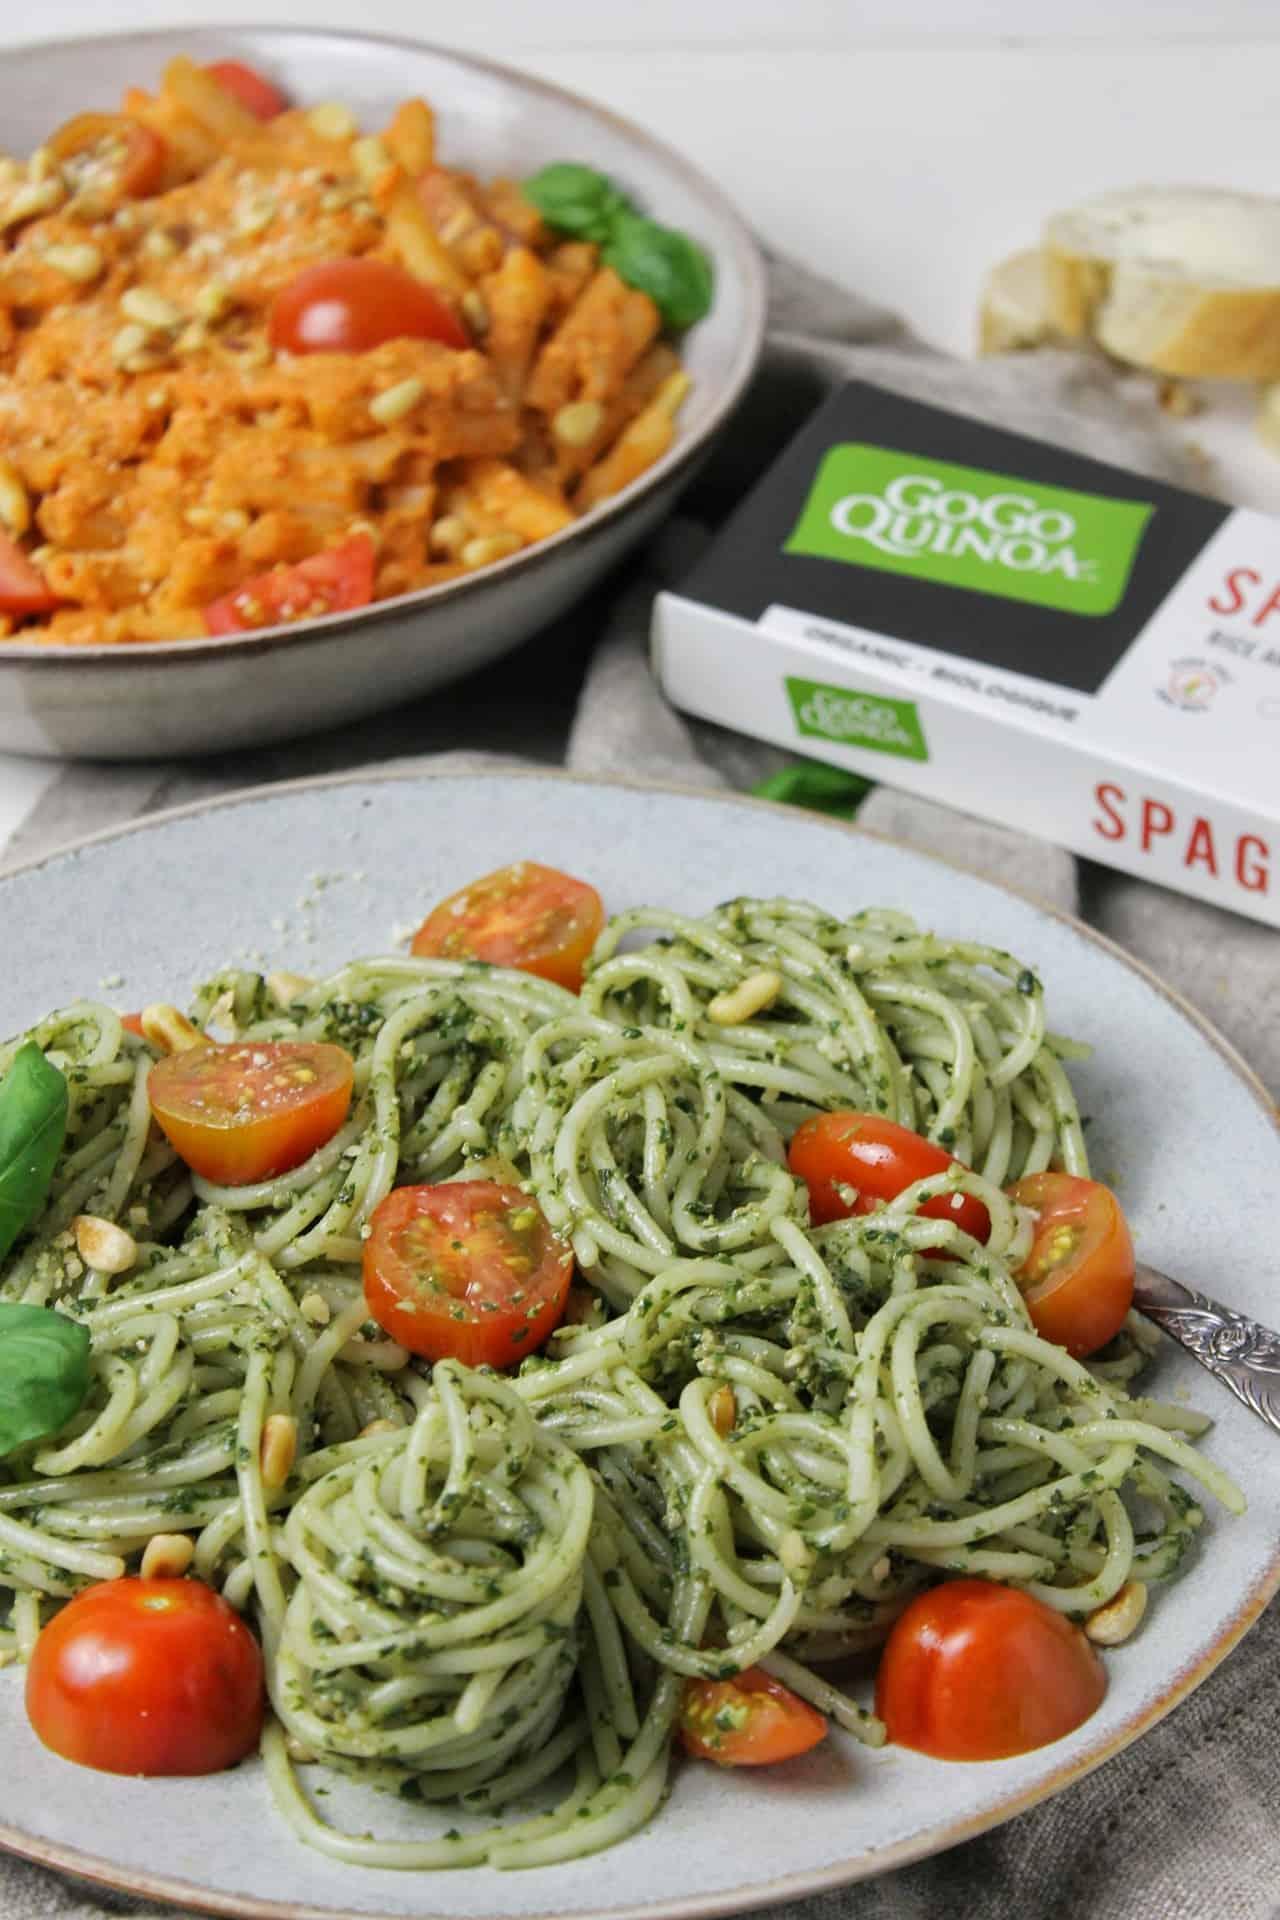 Spaghetti sans gluten au pesto vegan